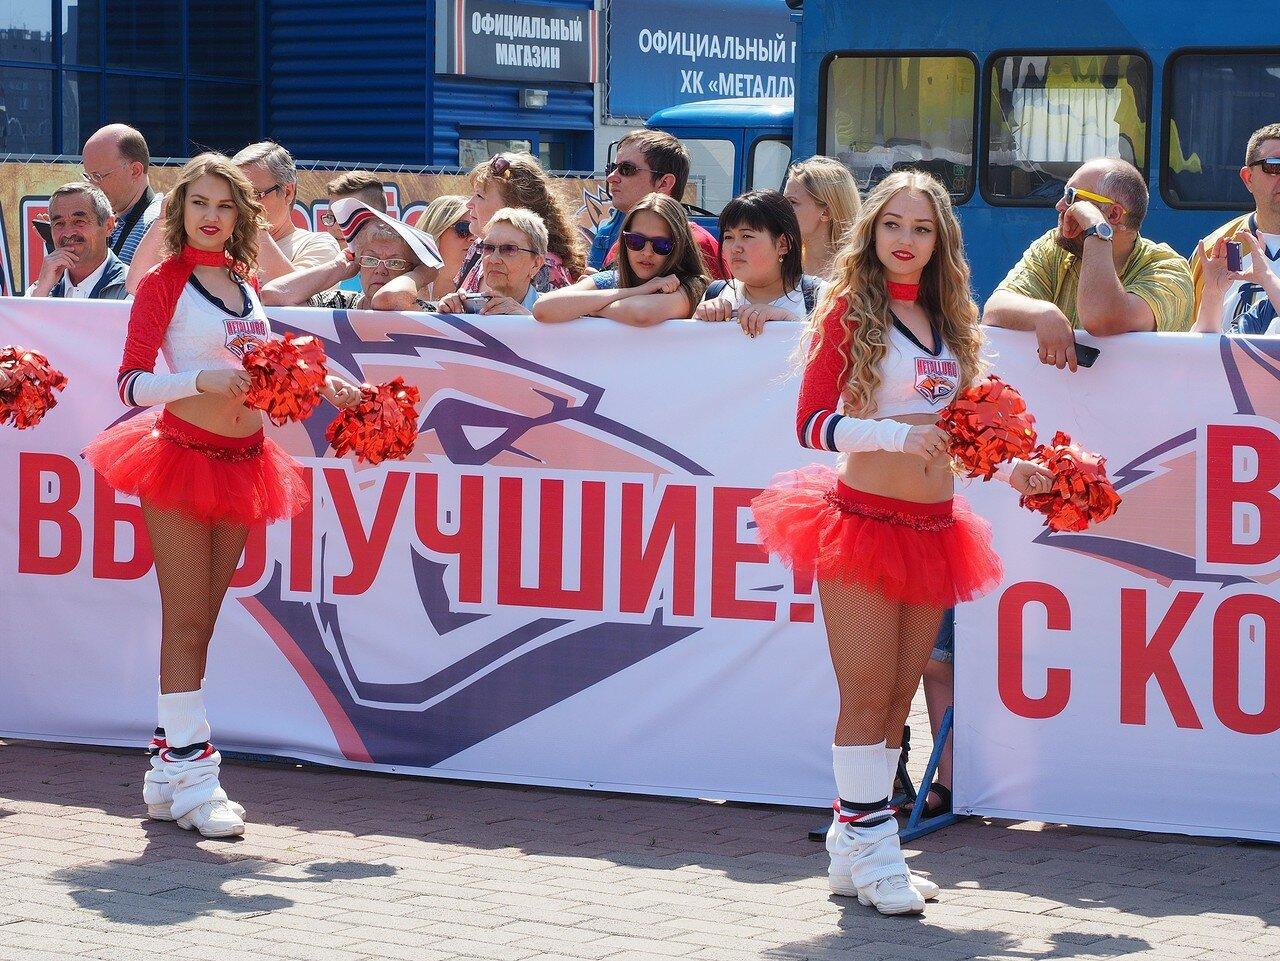 6Церемония чествования команды Металлург27.05.2016